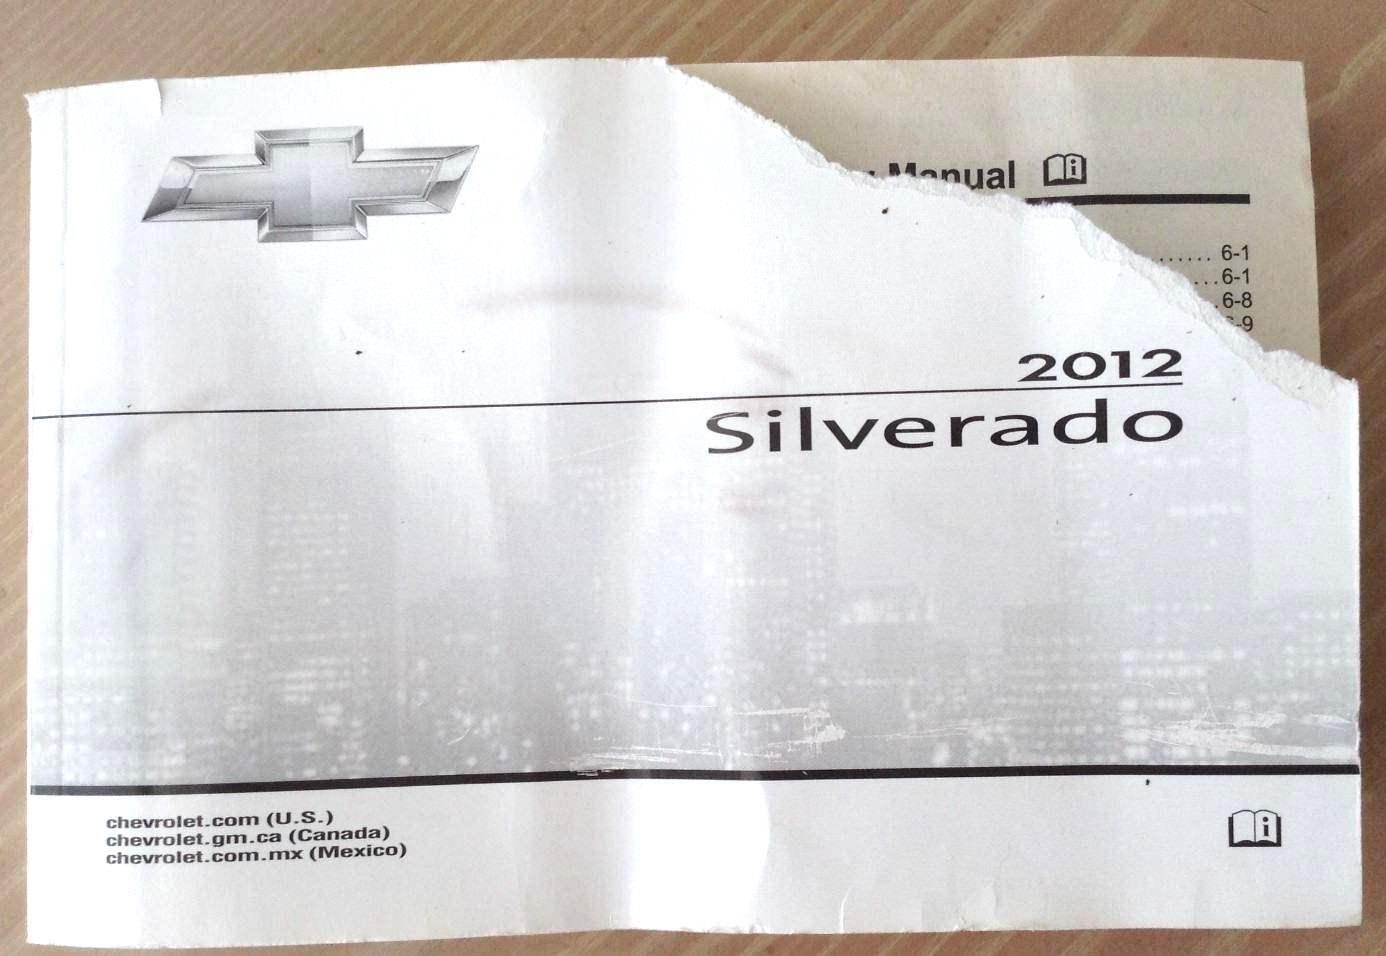 Chevy Chevrolet 2012 SIVERADO Owner Manual